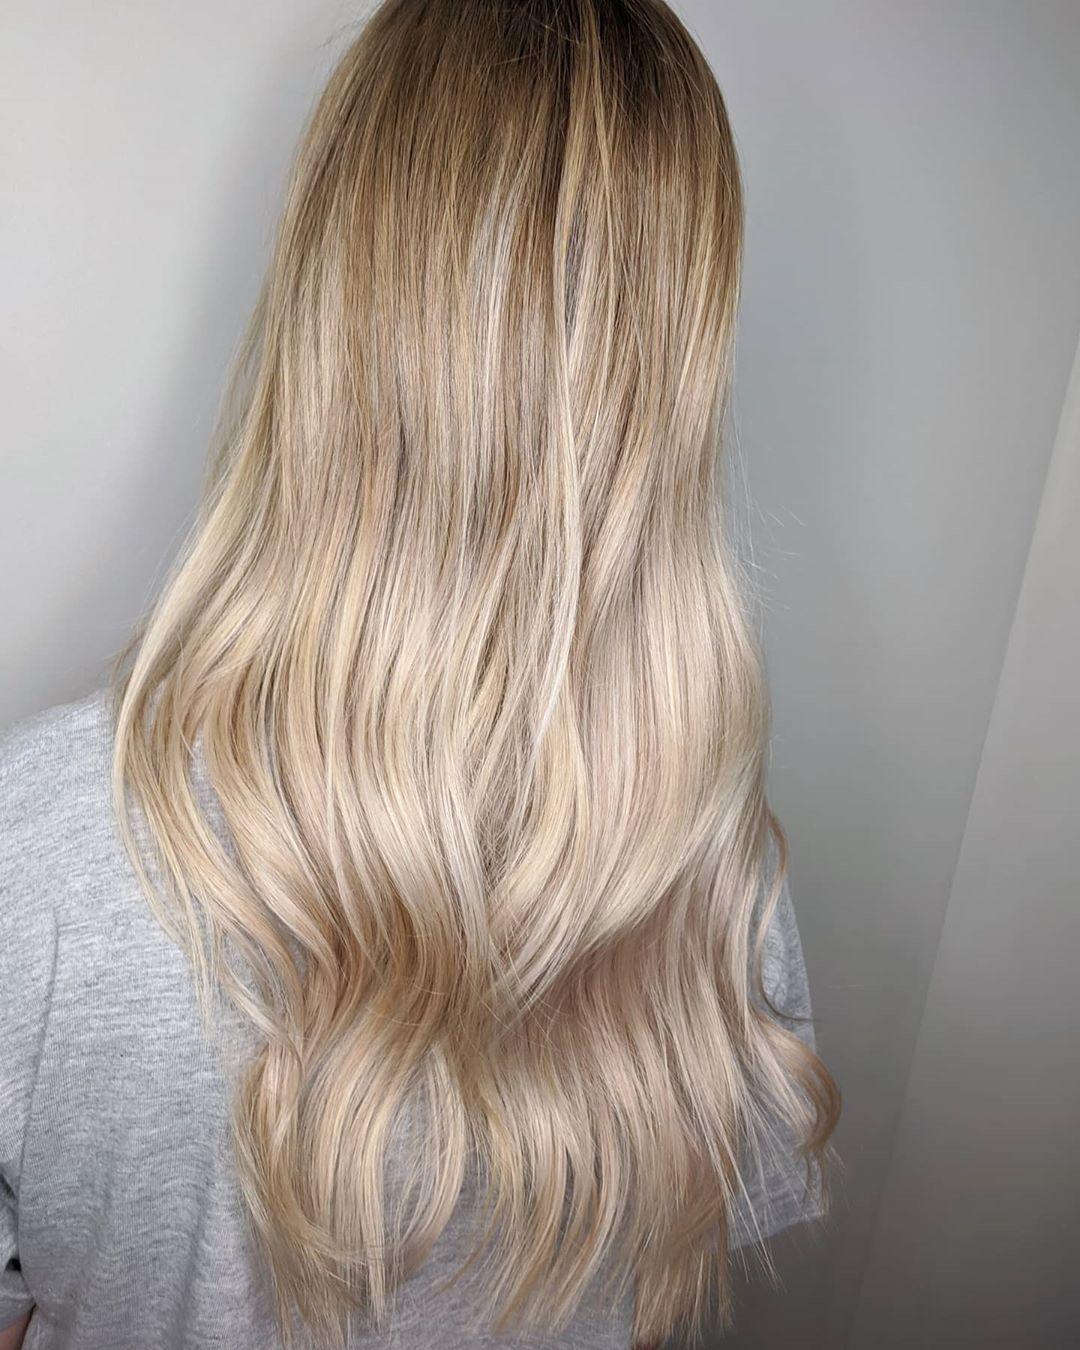 Lived in Blonde ✨✨✨ @hairhouseblacktown @hairhouseaustralia @matrix #matrixcolor #matrixaustralia #matrixcolour #matrix #livedinhair #livedinblonde #balayage #balayagehighlights #blonde